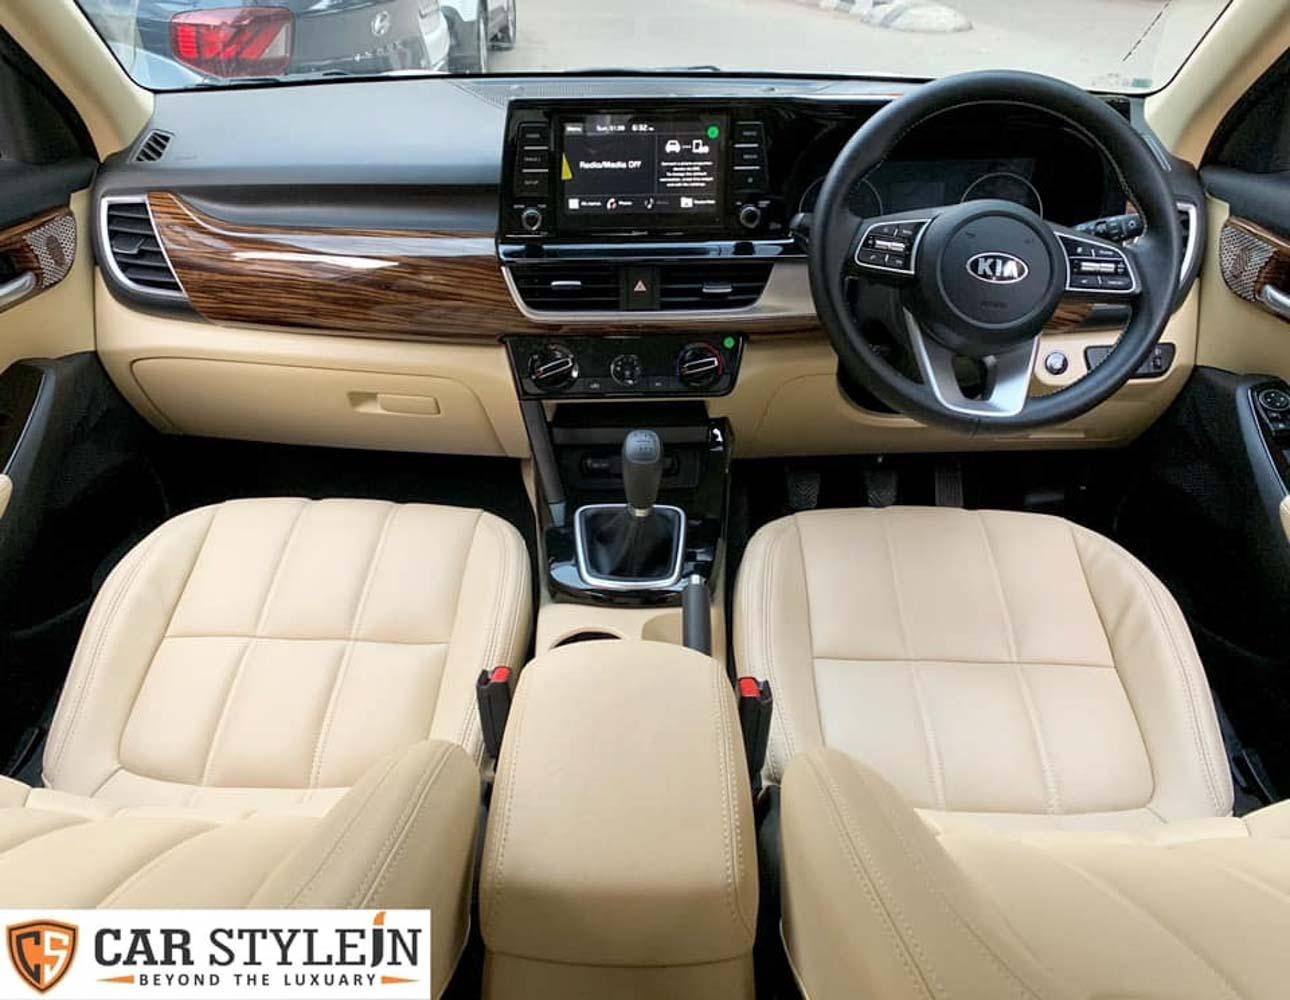 Kia Seltos Customized With Luxurious Cabin Looks Opulent